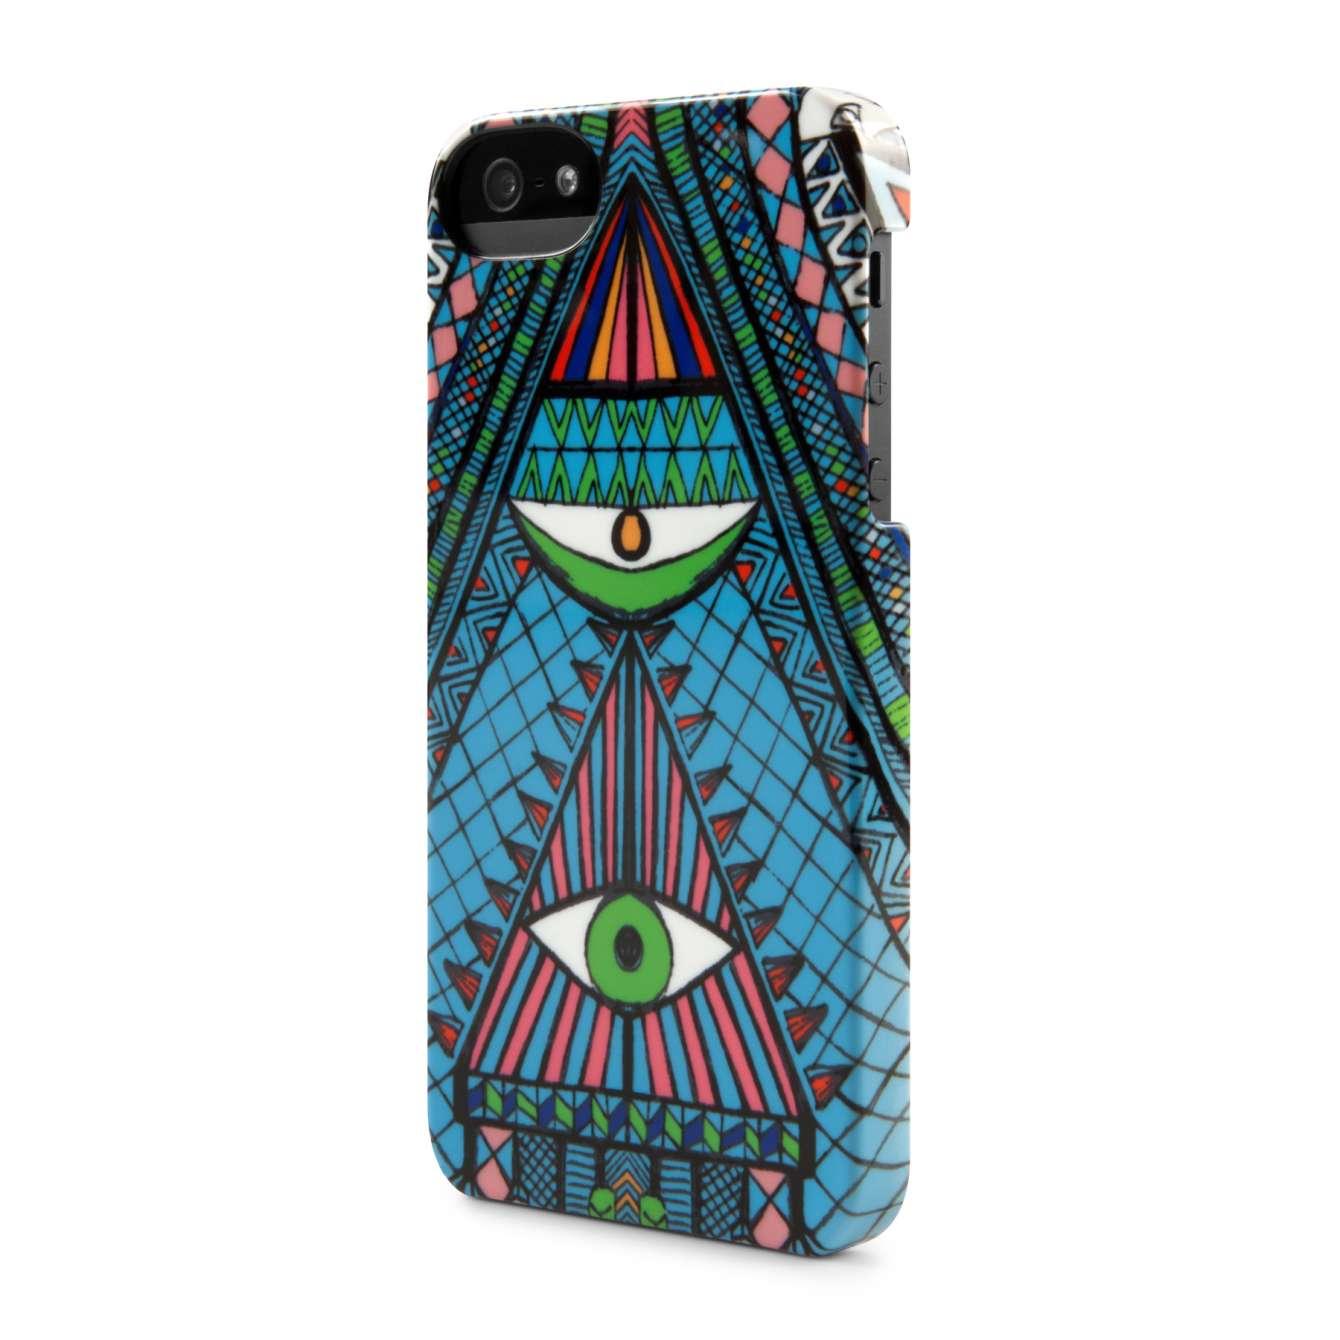 Mara Hoffman x Incase iPhone 5 Snap Cases